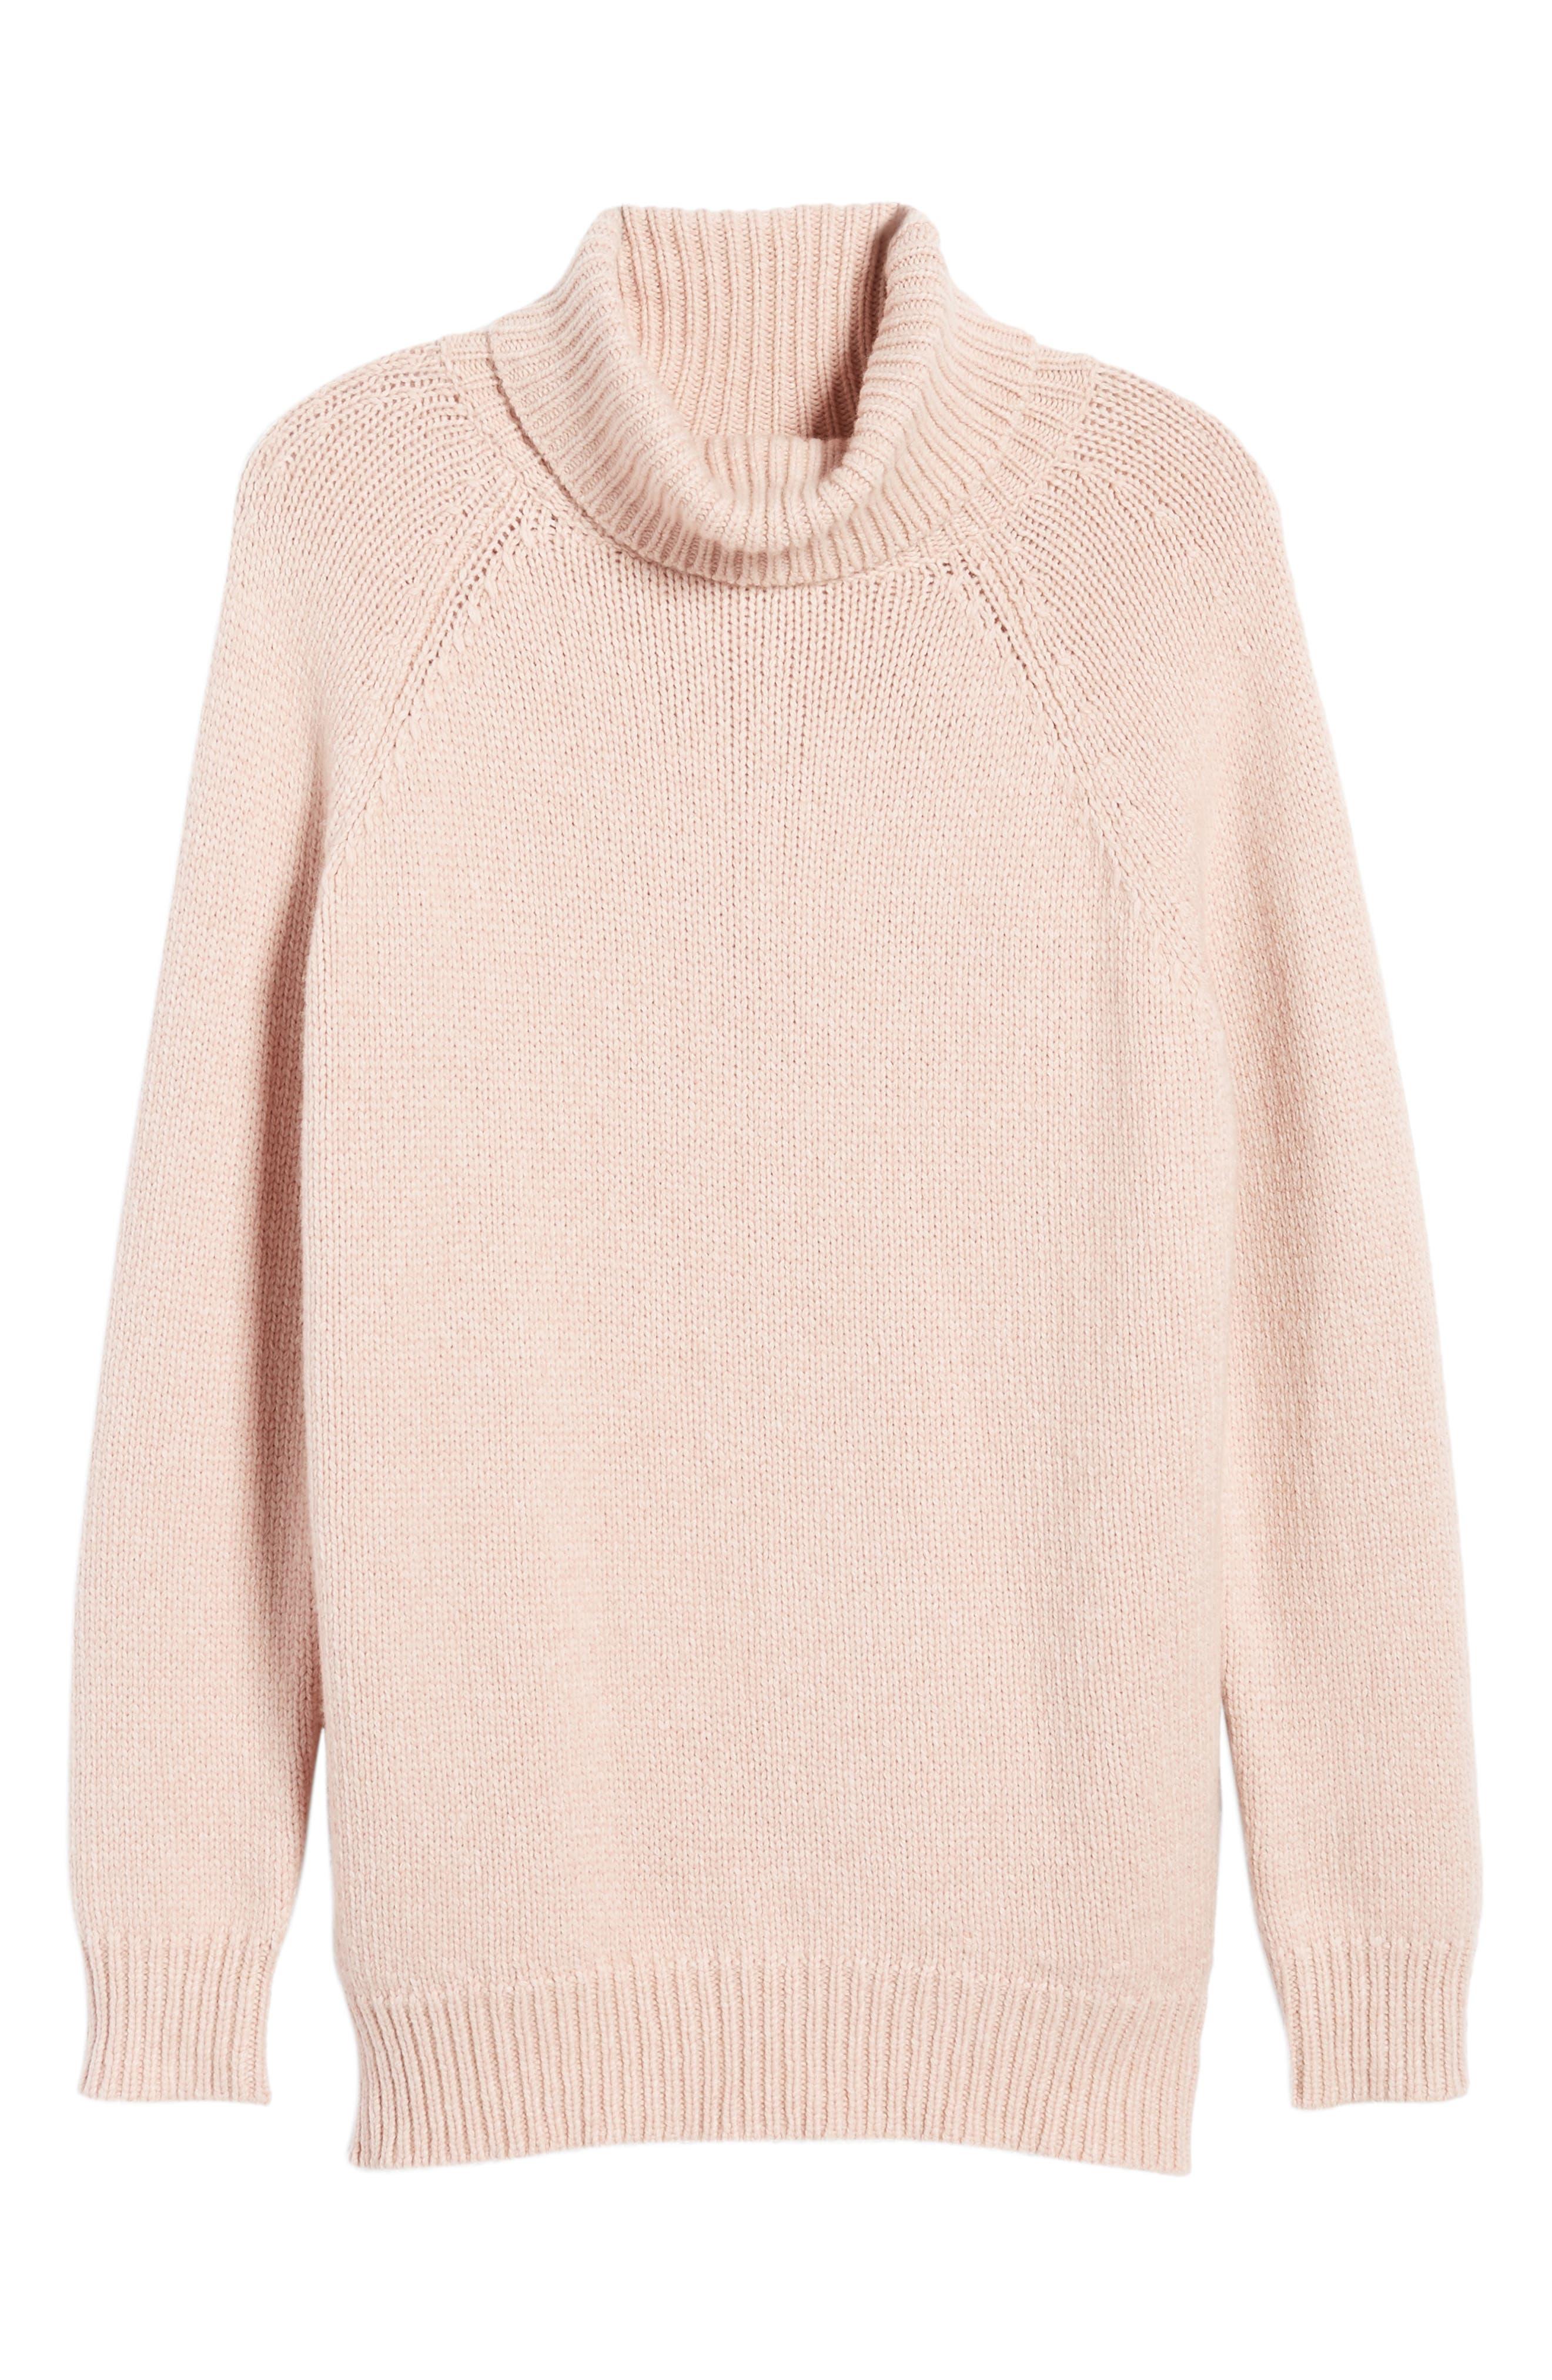 Textured Turtleneck Sweater,                             Alternate thumbnail 12, color,